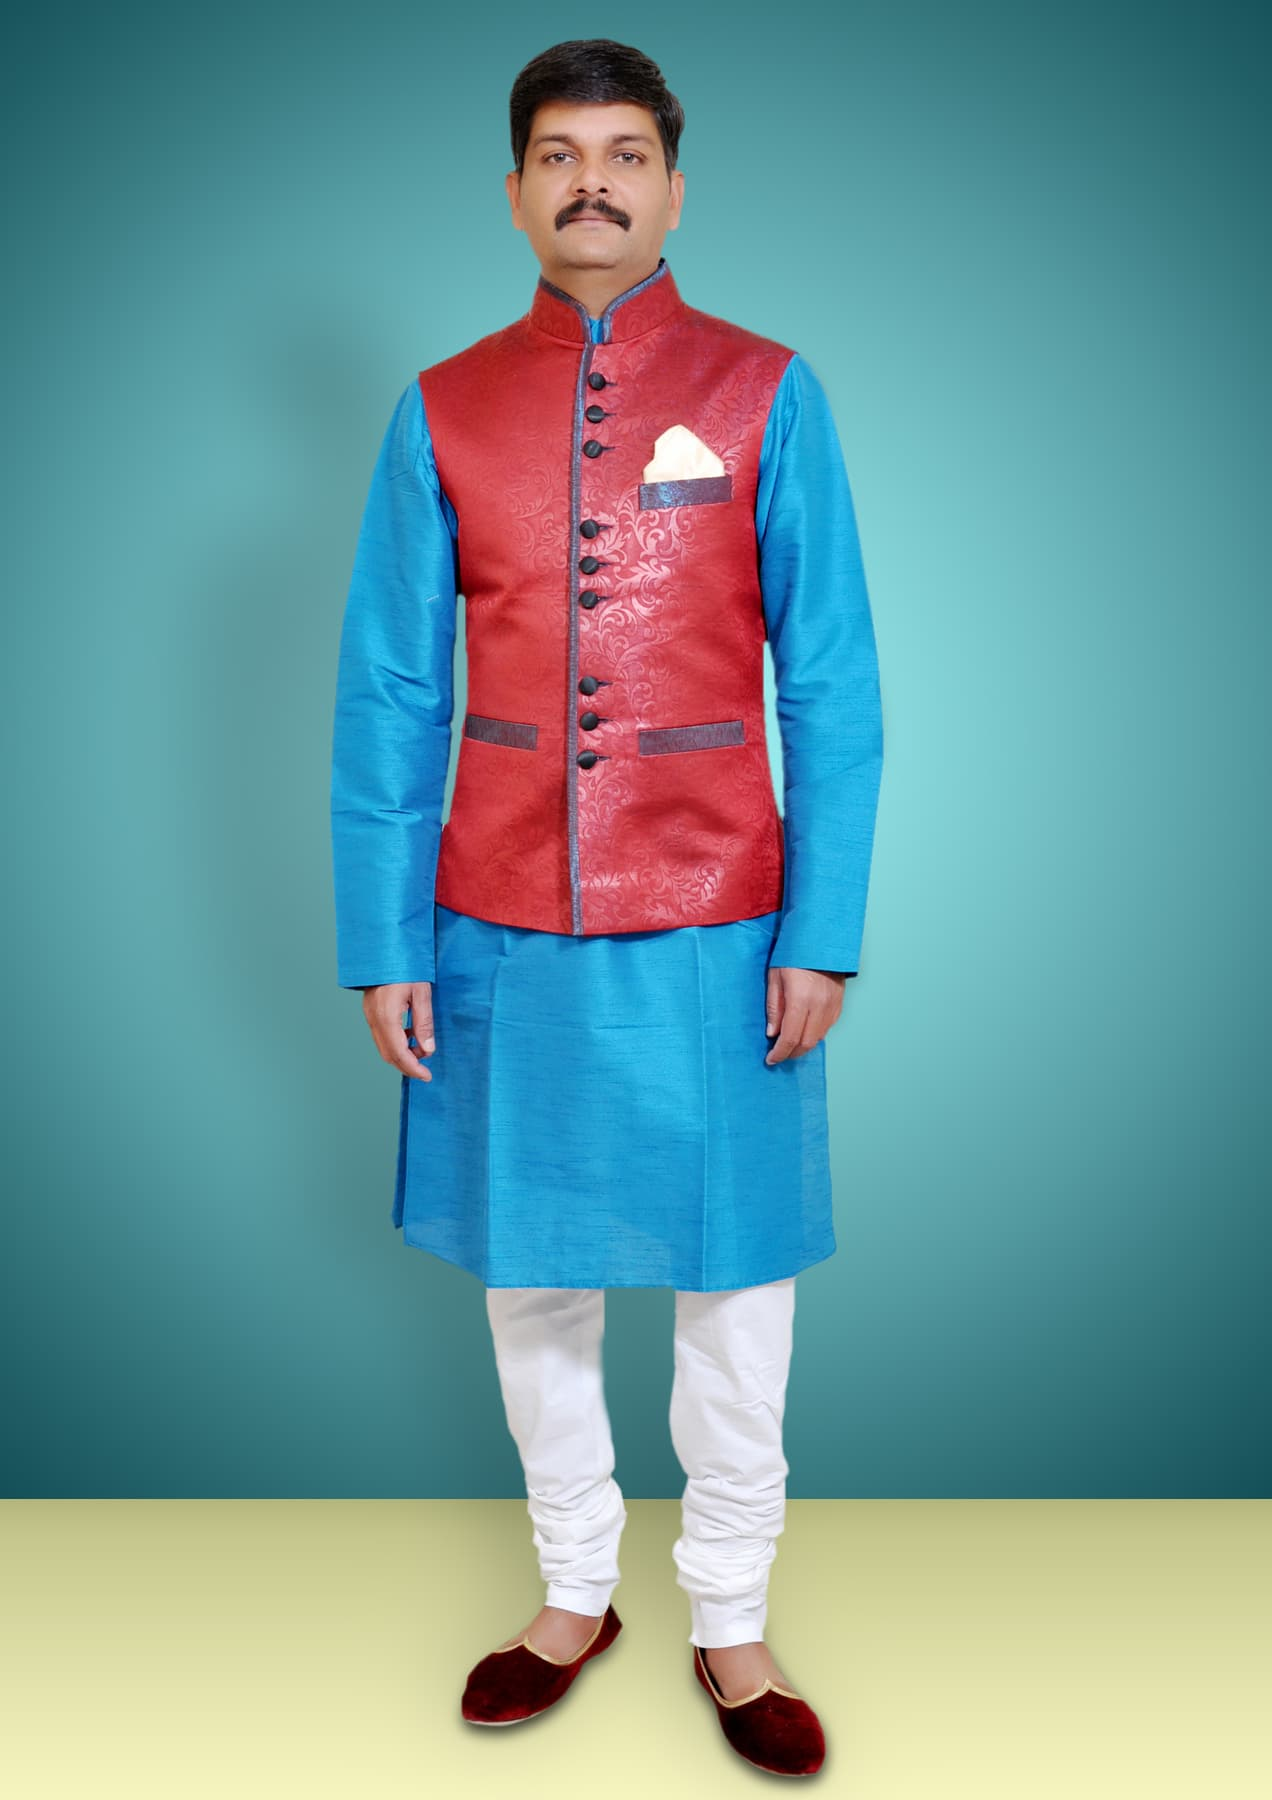 Mens Ethnic Clothing on Rent & Lend: Vastram Fashion Rental India